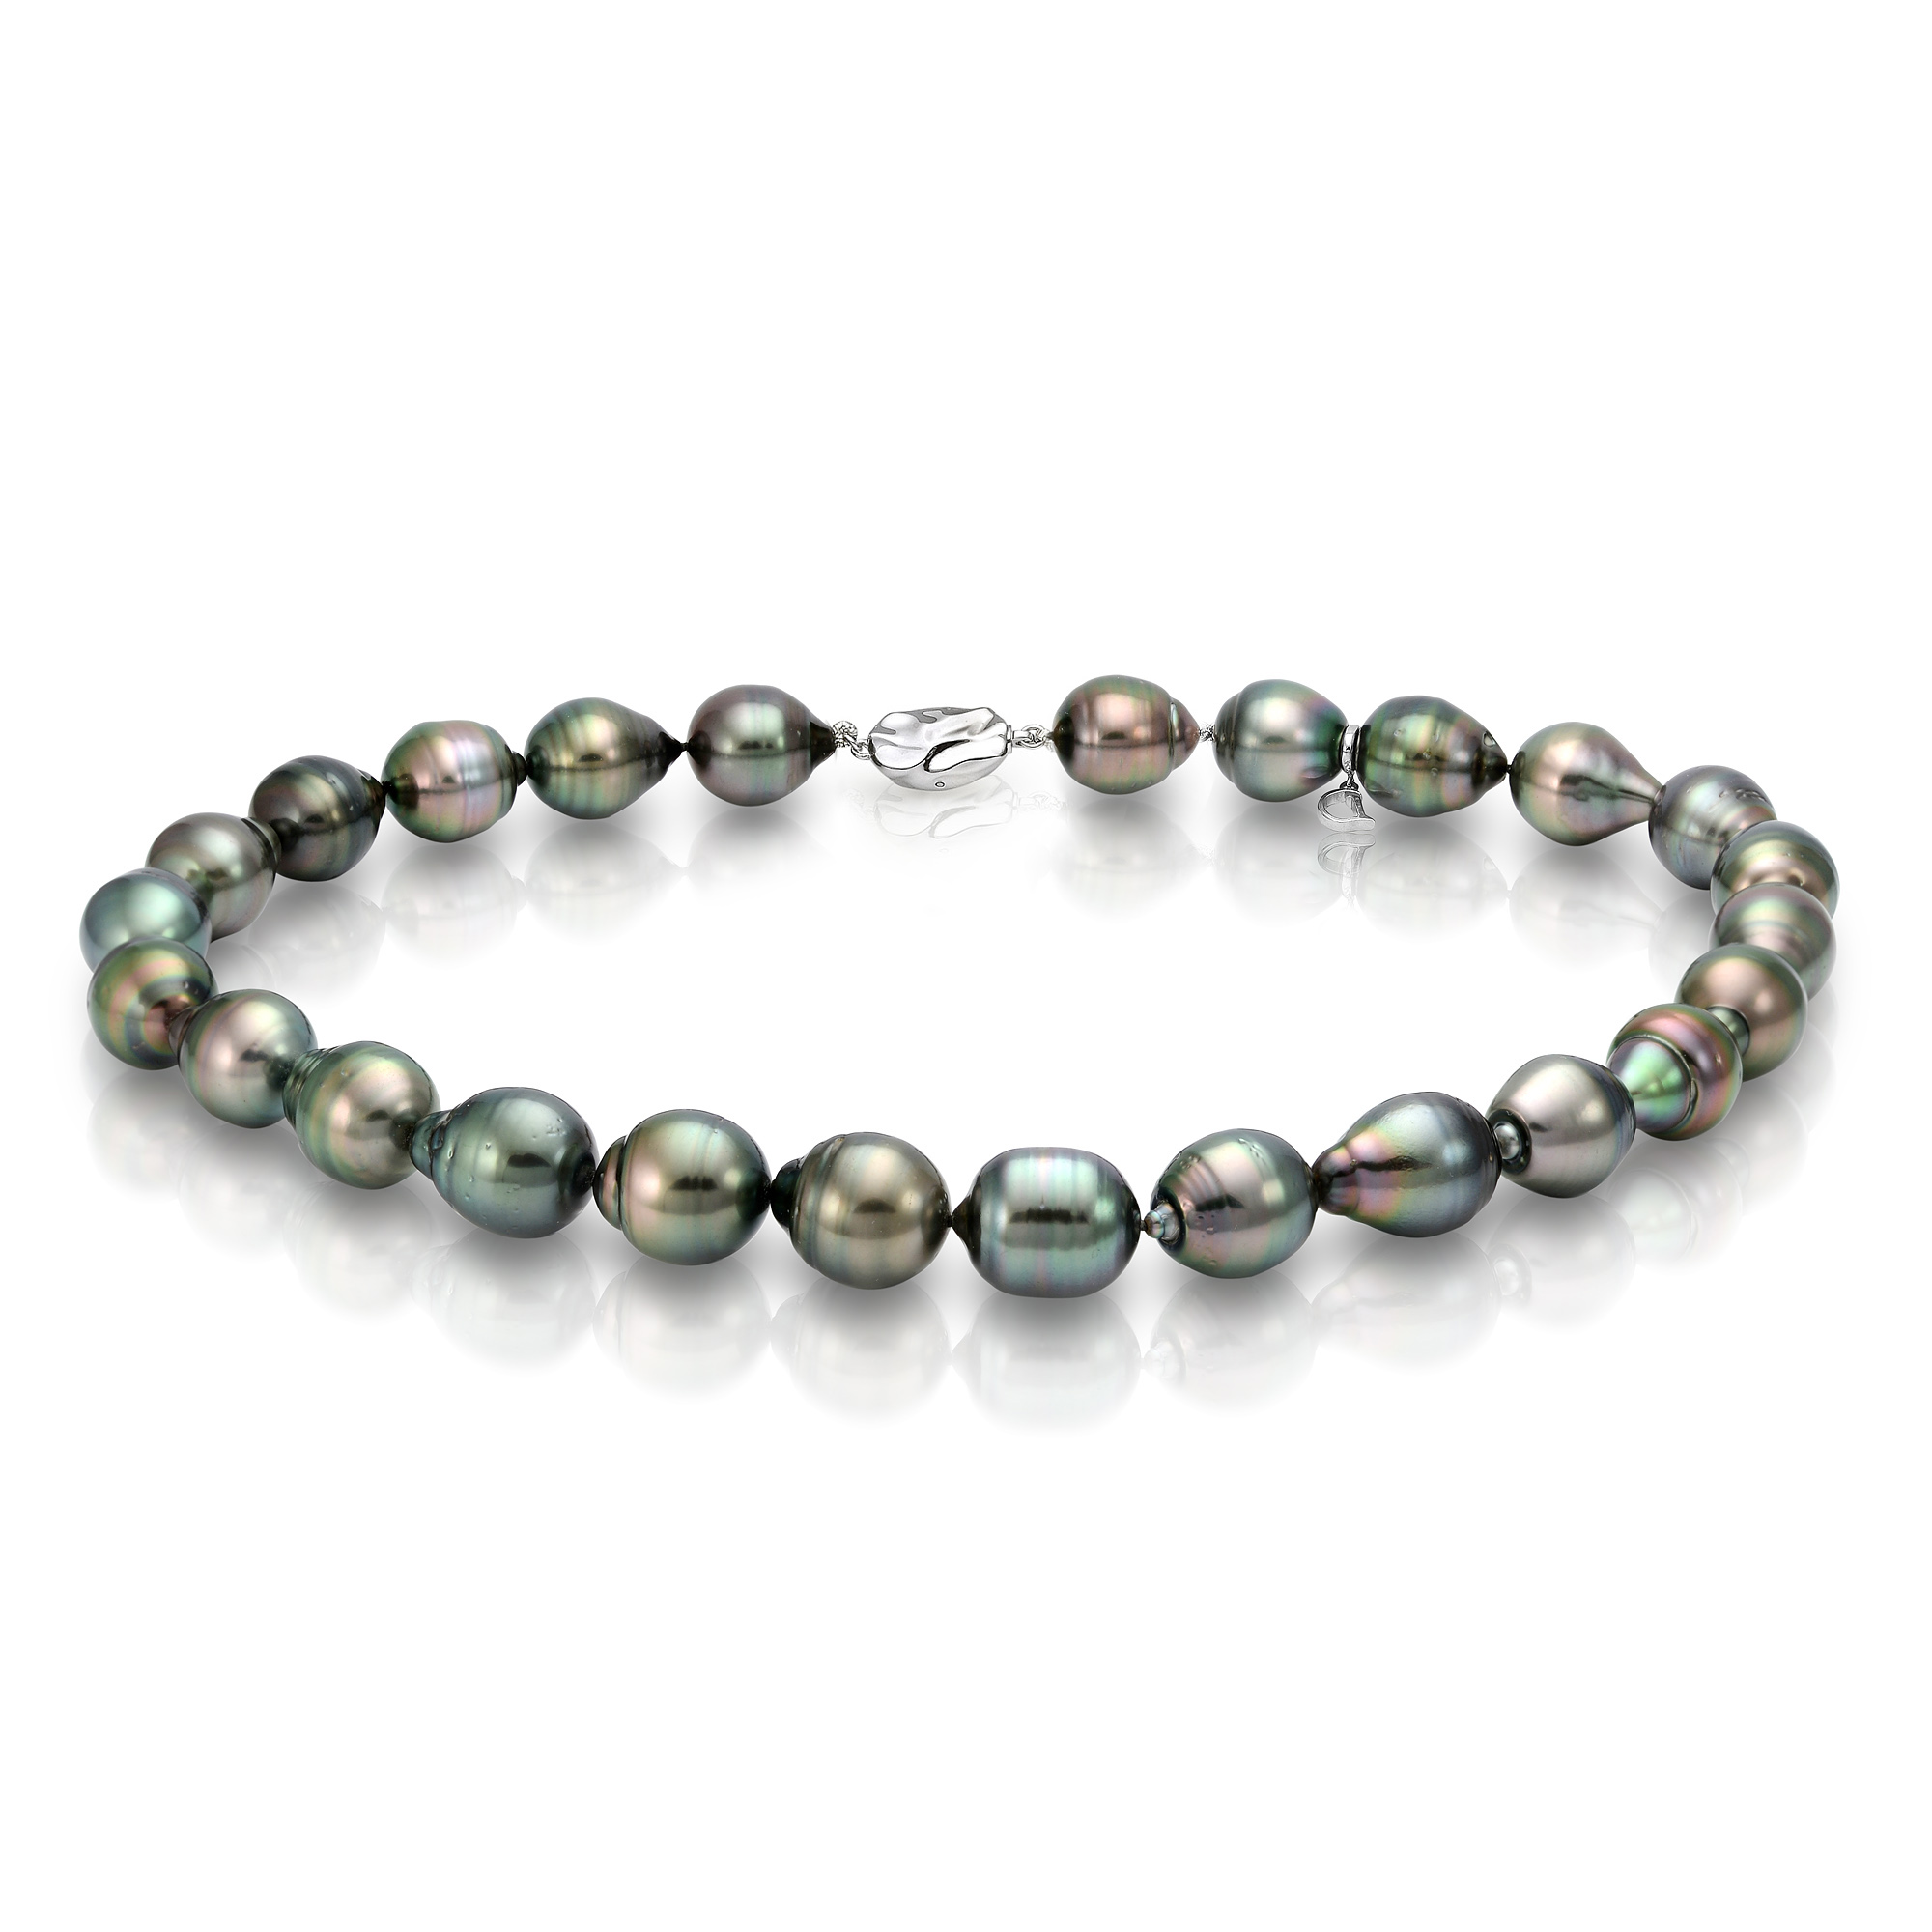 Ожерелье из барочного морского Таитянского жемчуга 11-13,2 мм